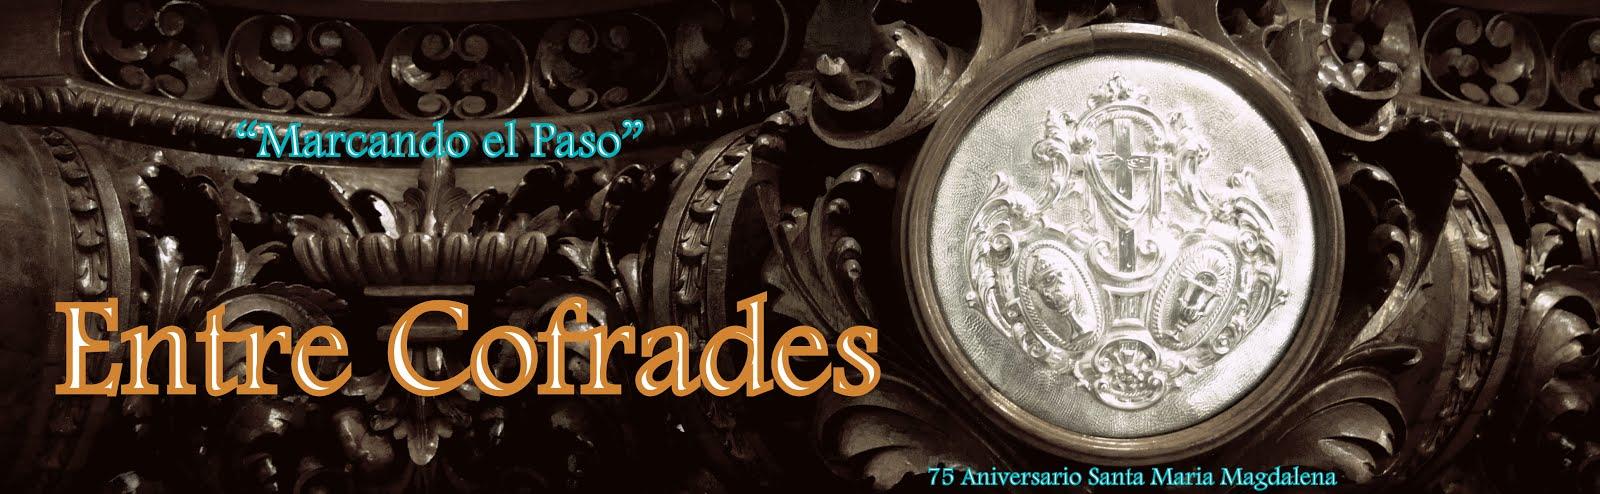 entrecofrades.blogspot.com